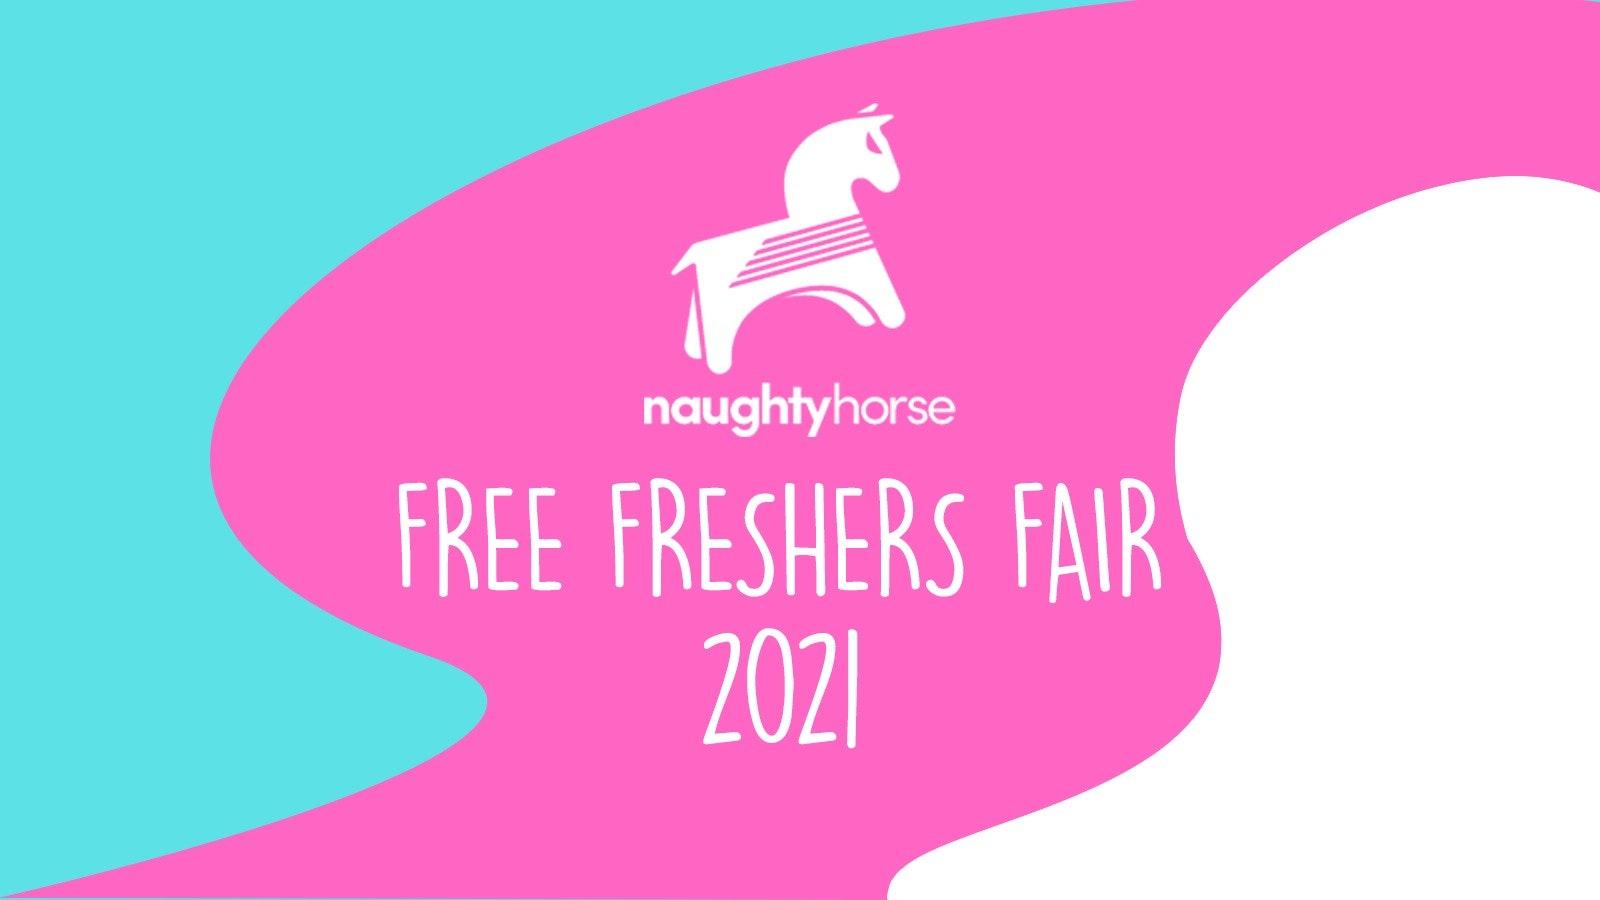 FREE Birmingham Re-Freshers Fair 2021! [Naughty Horse]